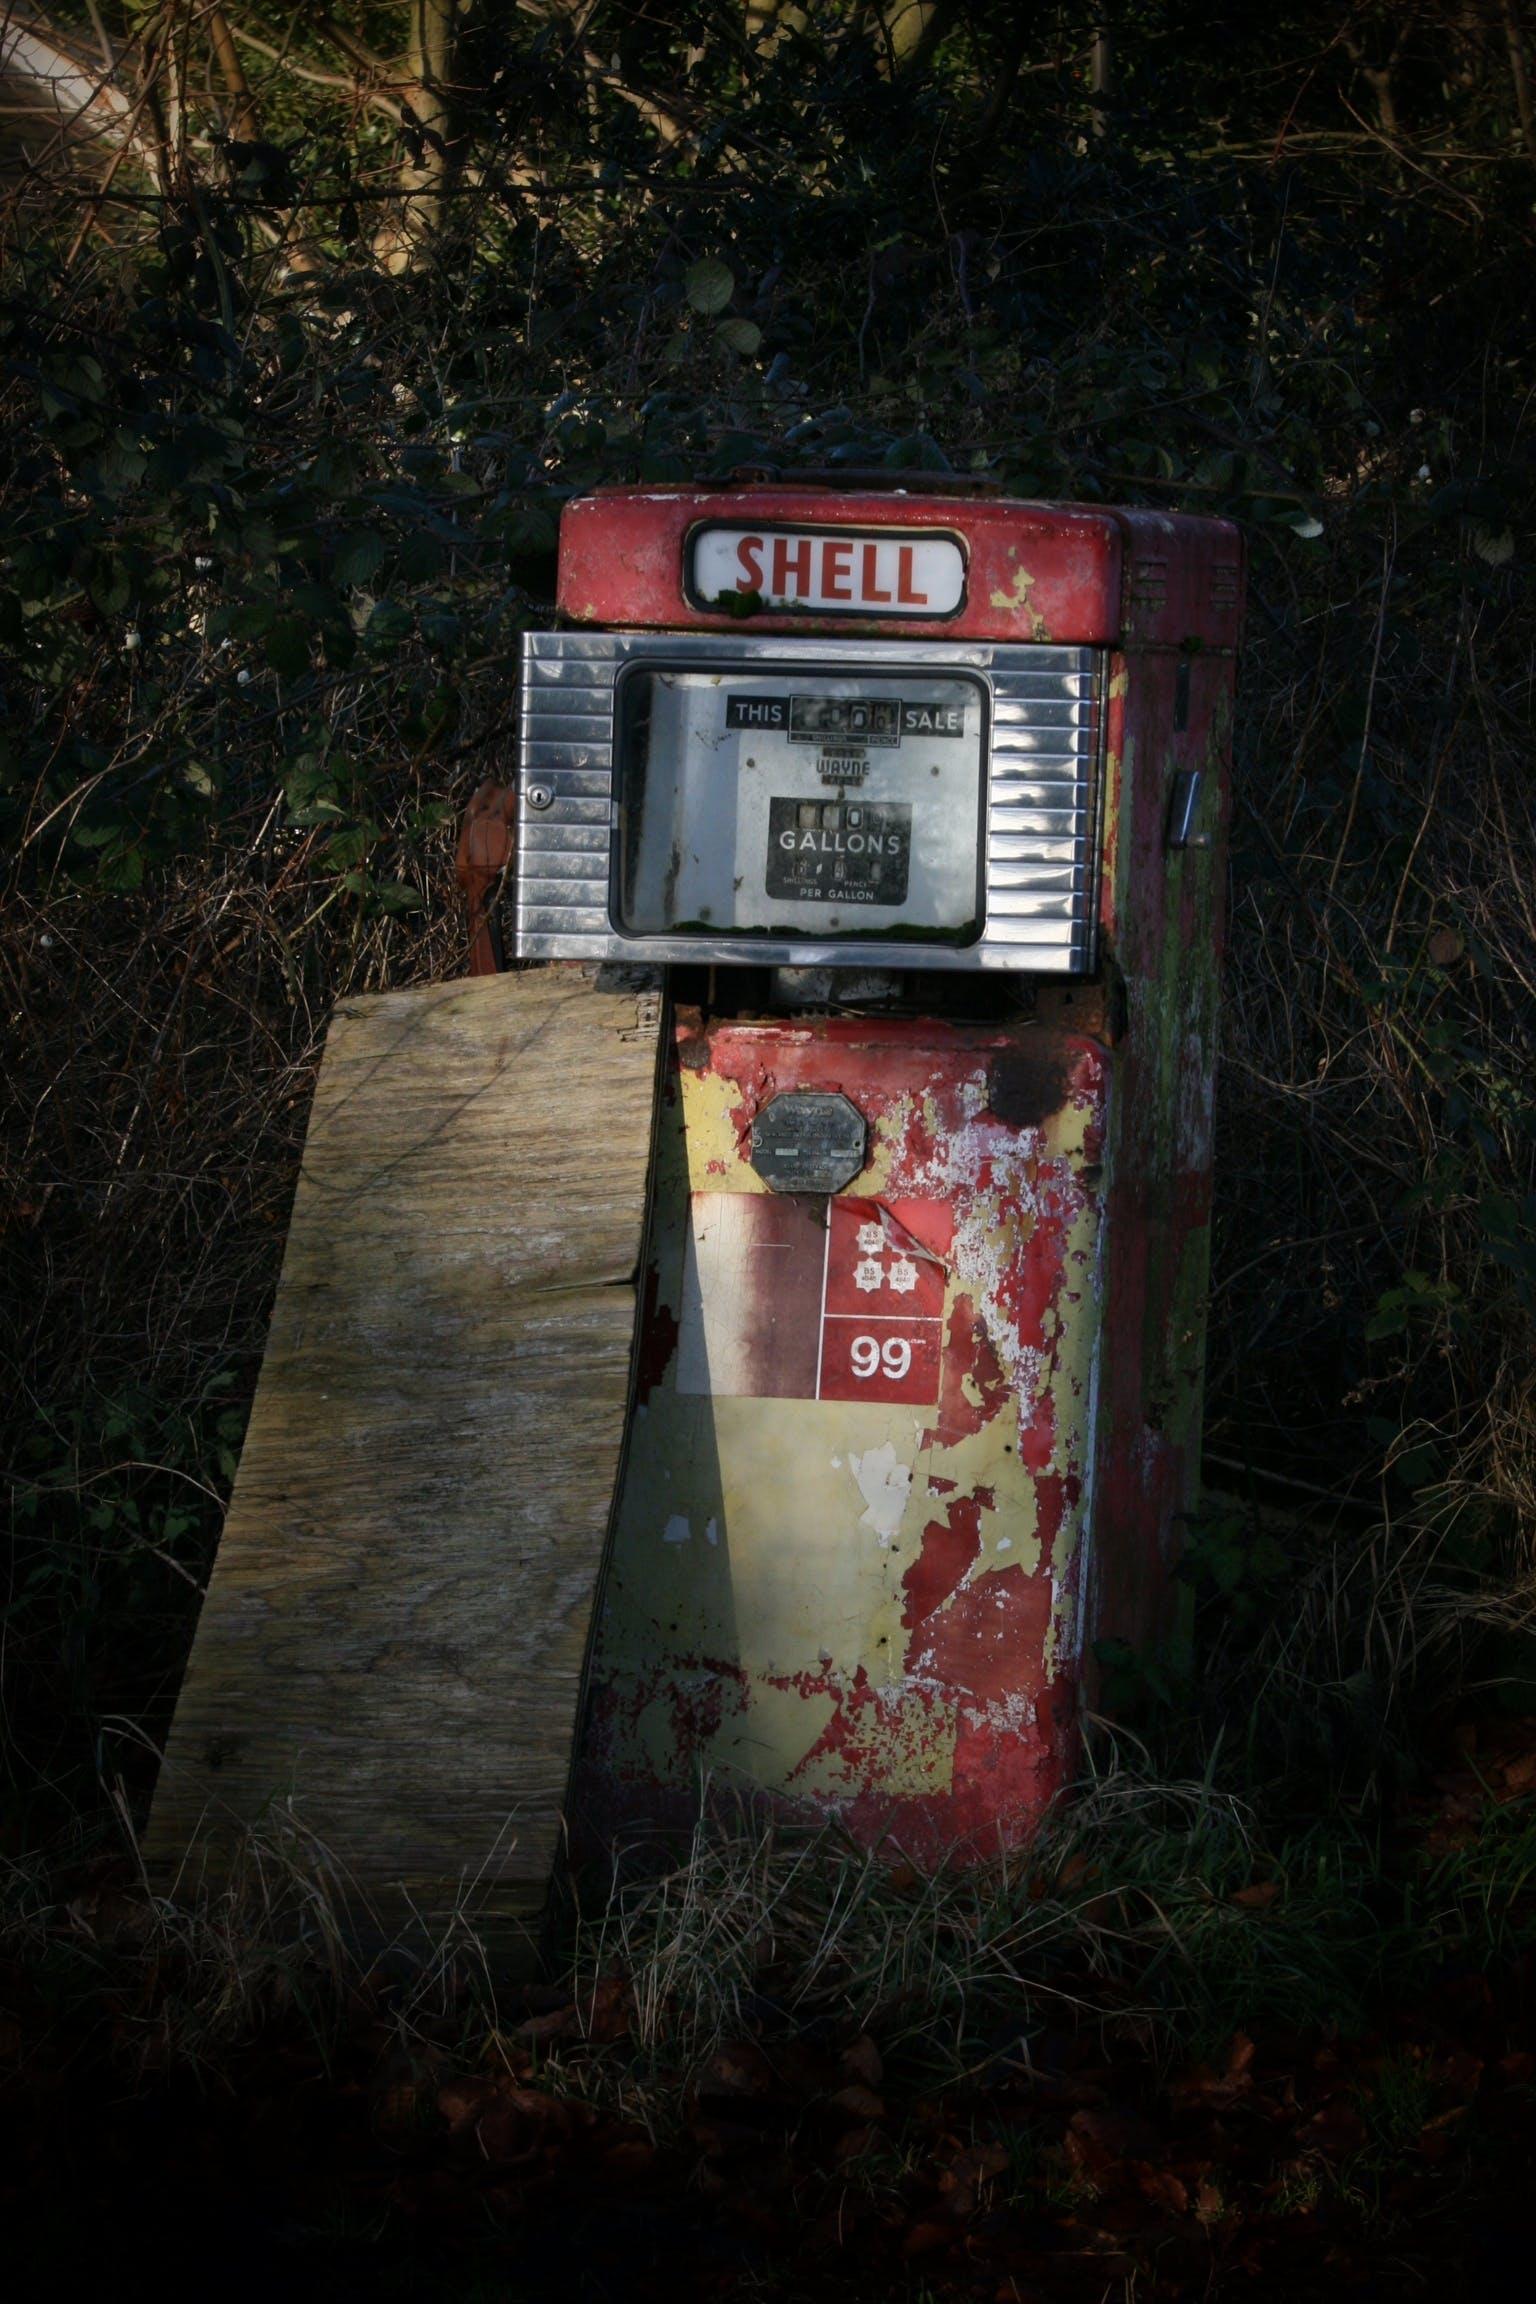 Free stock photo of gas station, petrol pump, petroleum, shell